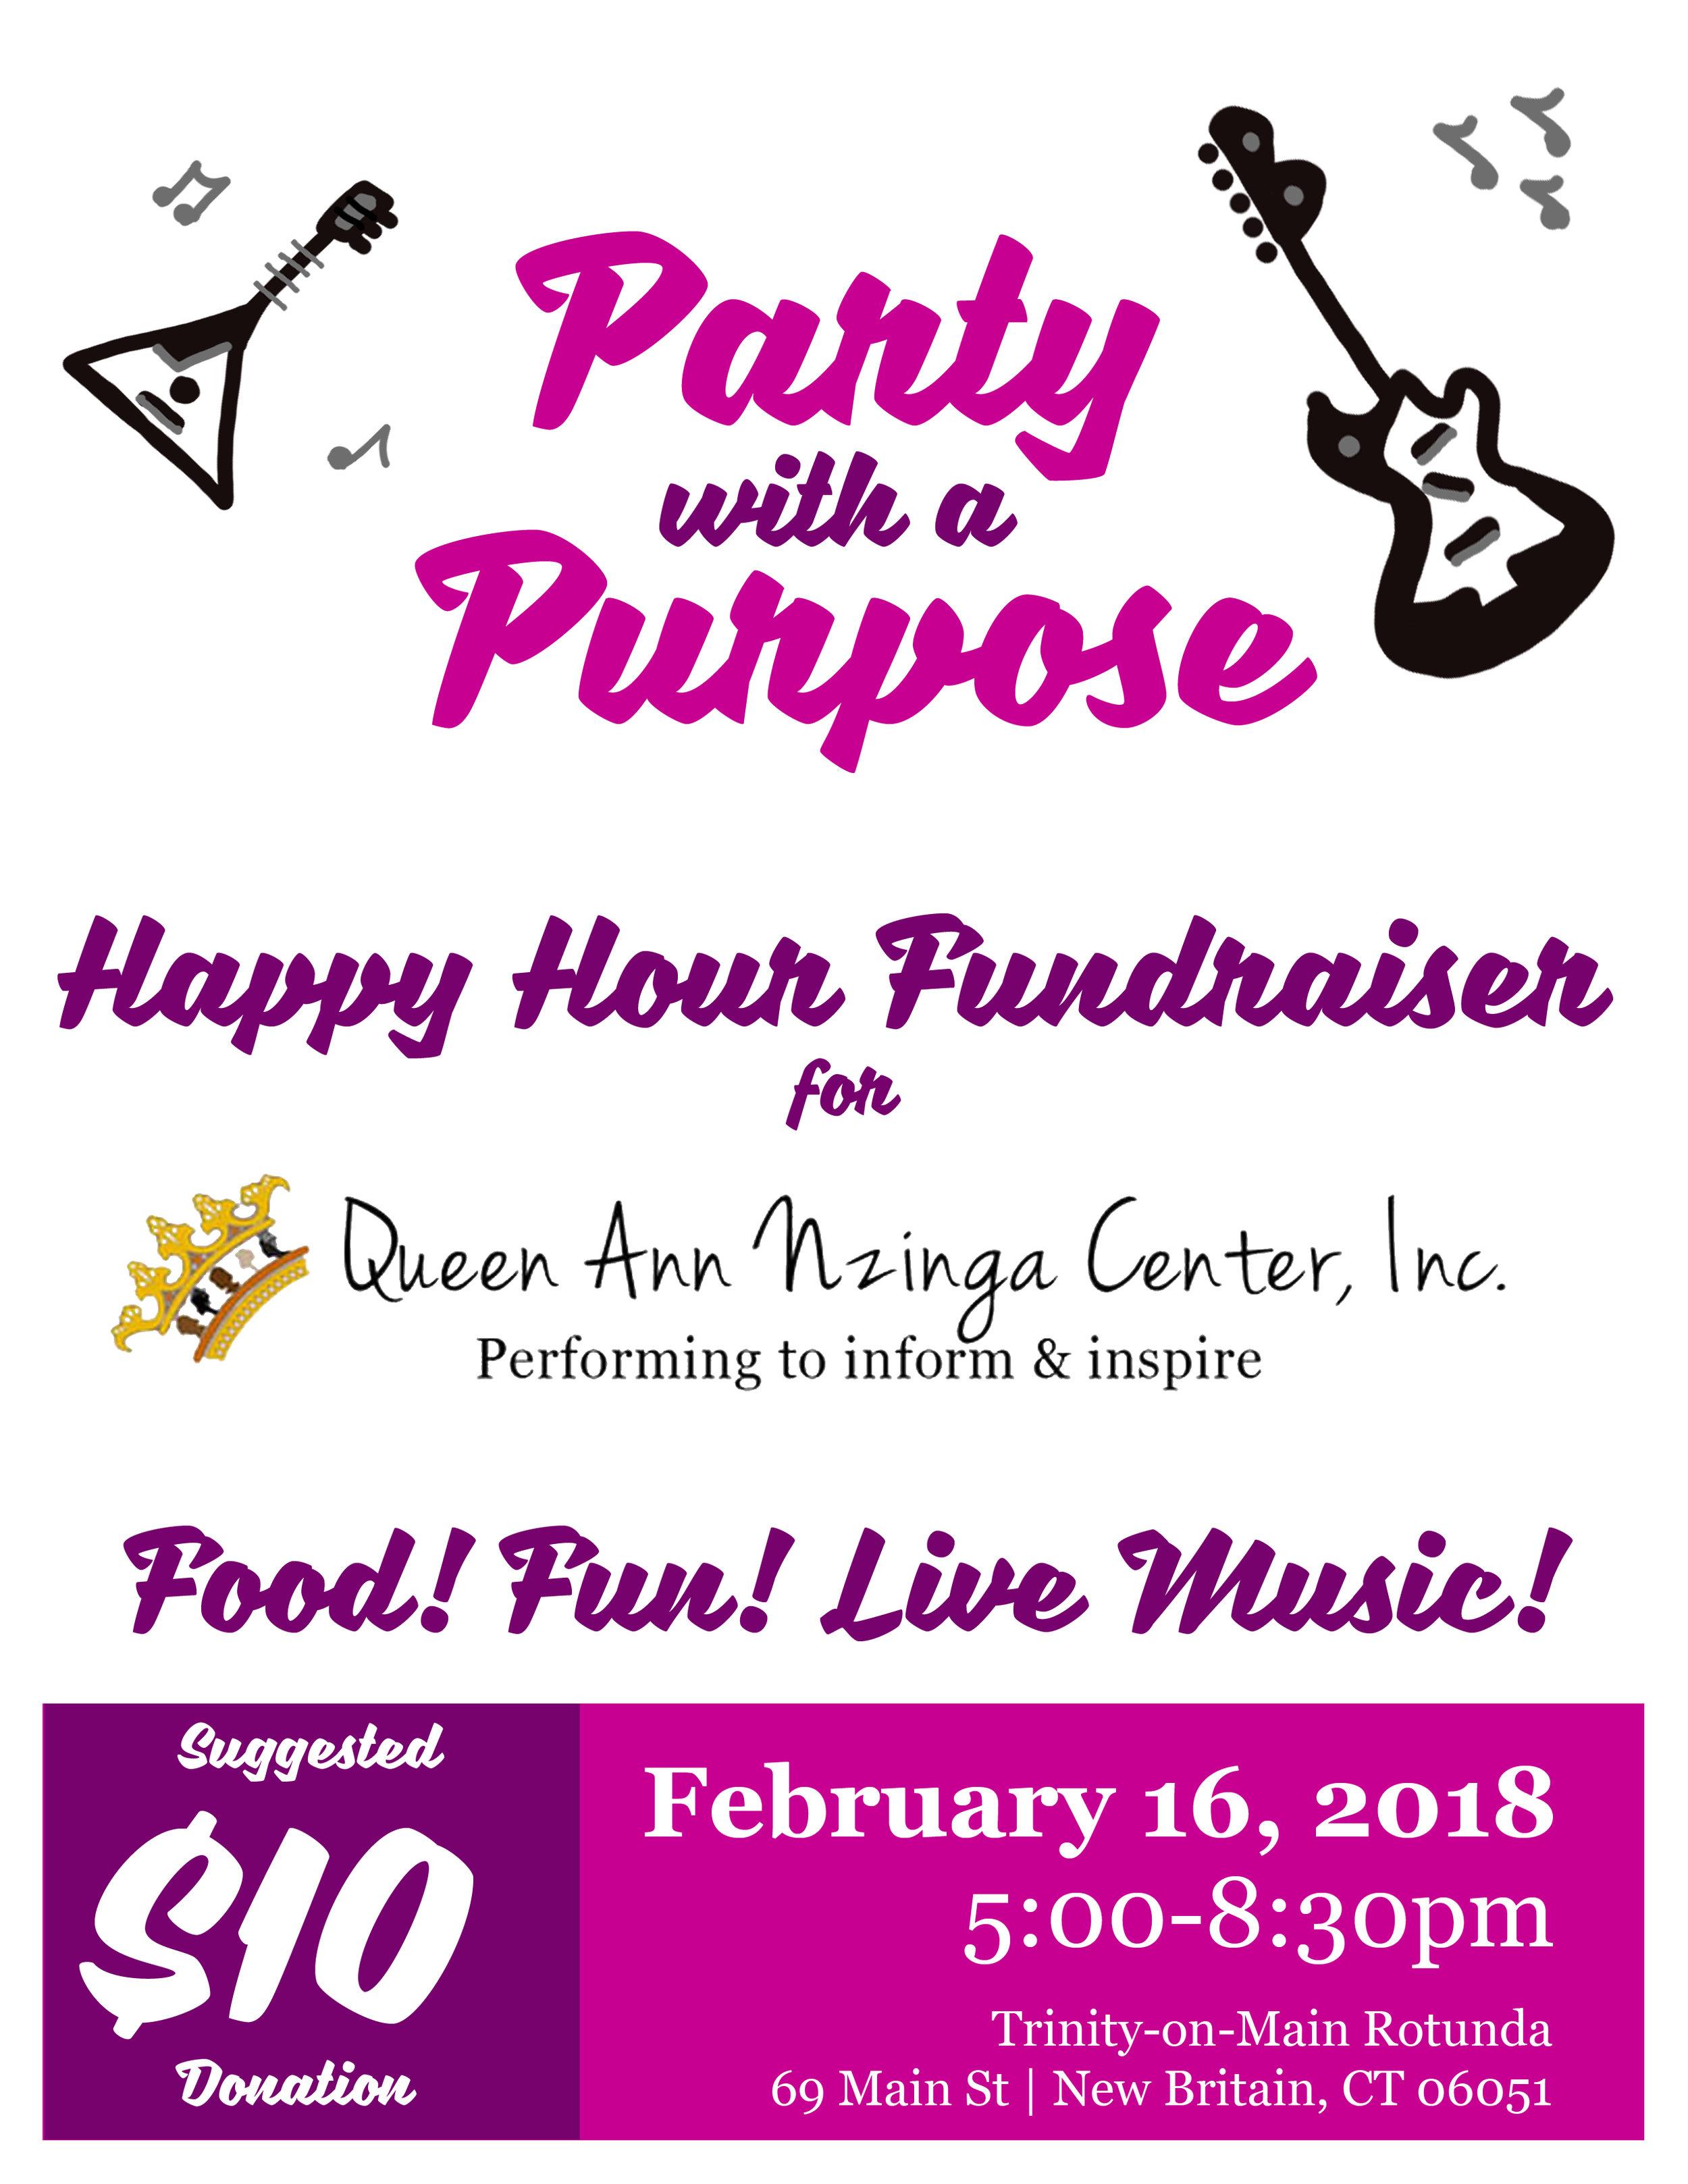 fundraiser happy hour feb 2018.jpg